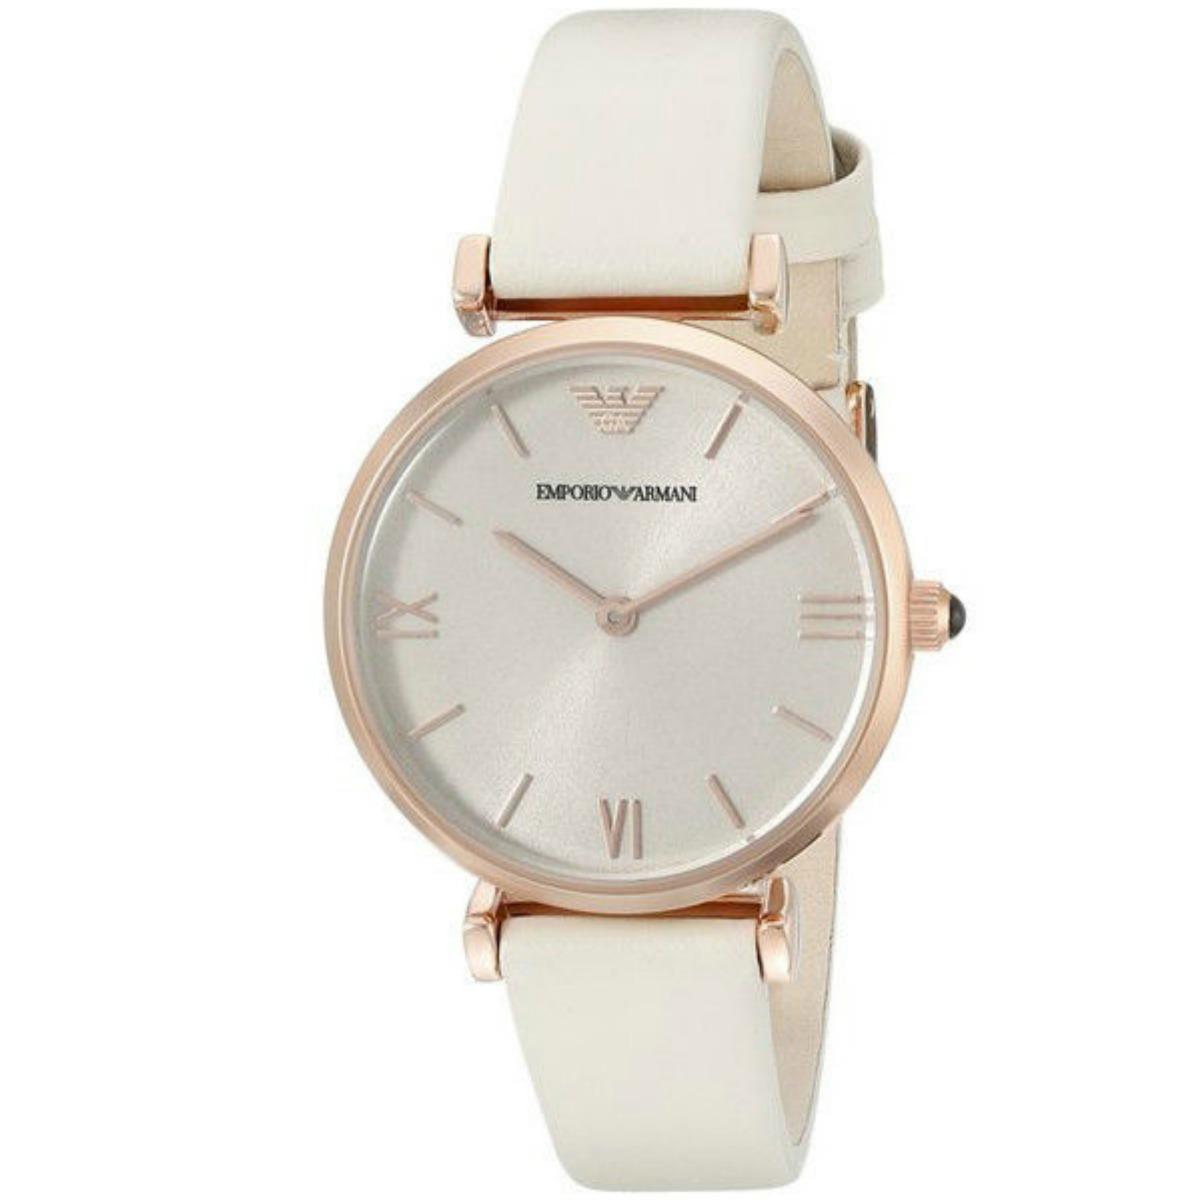 698381c251ff reloj emporio armani ar1769 original mujer. Cargando zoom.